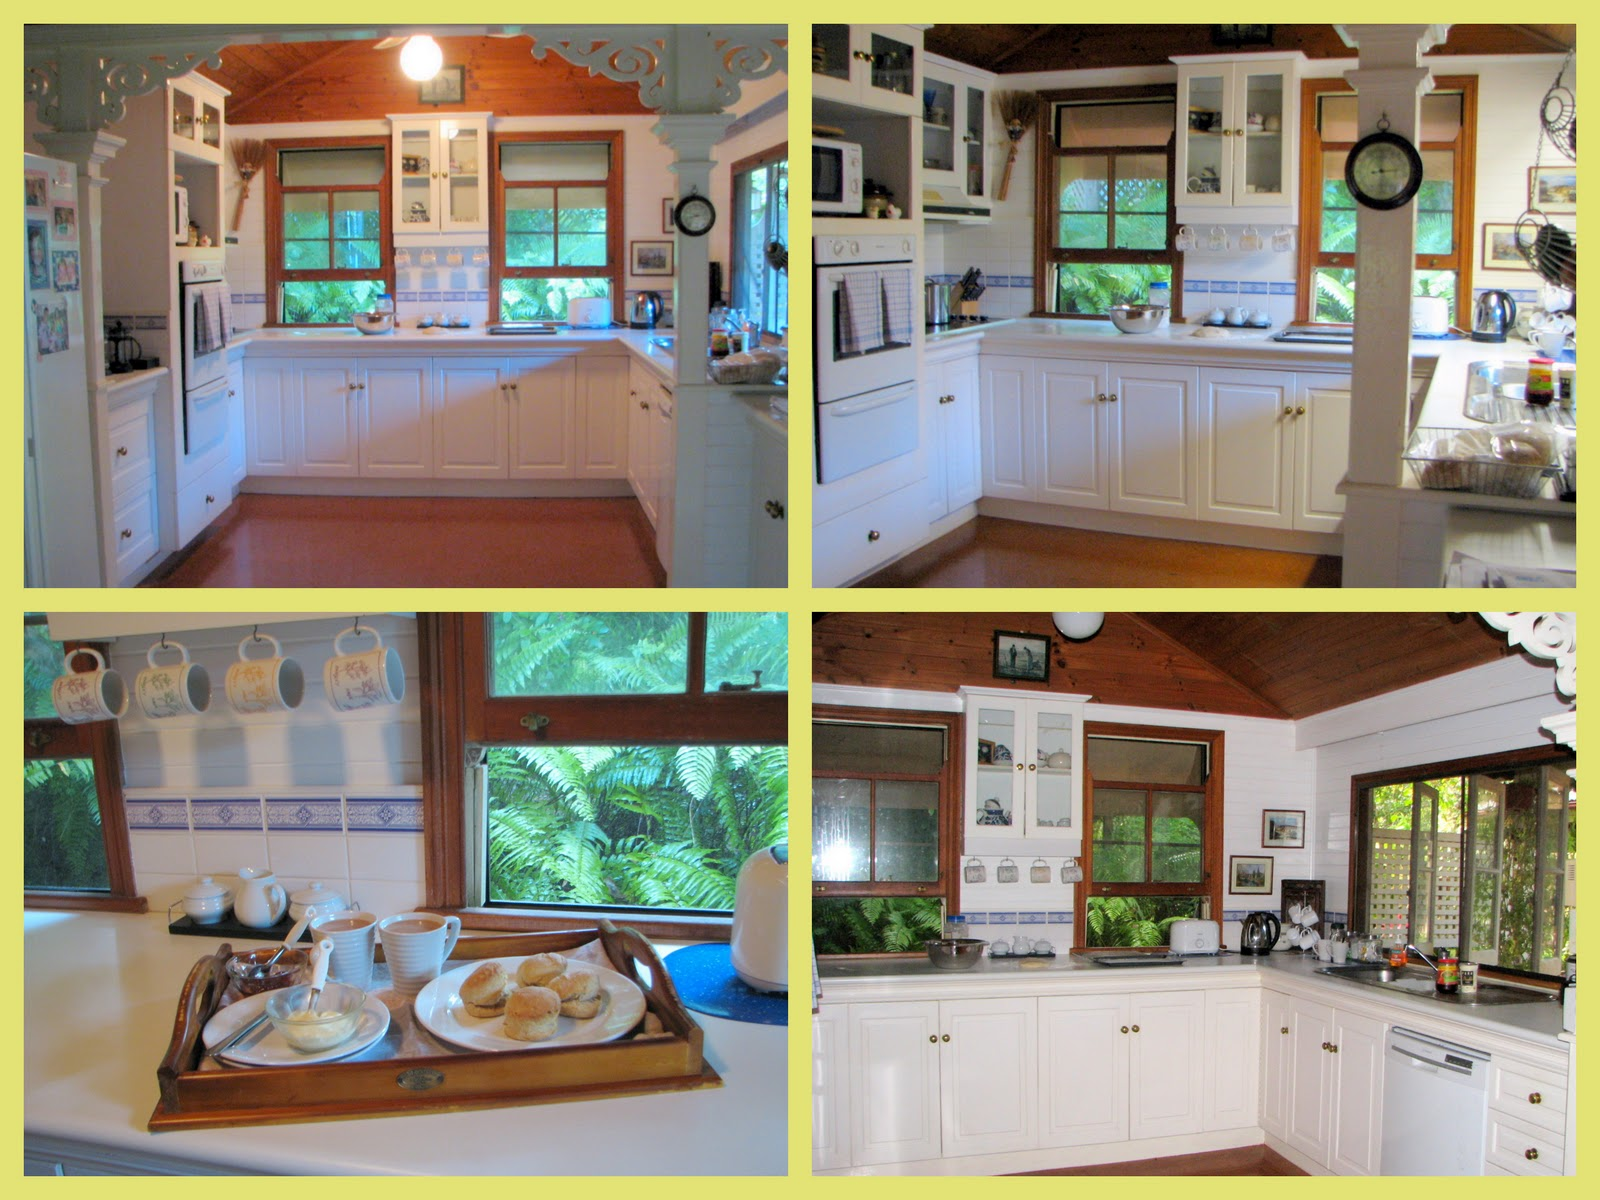 http://4.bp.blogspot.com/_SglUFd7ue3A/S9VG66PrCcI/AAAAAAAADv8/9TqXov2V_5g/s1600/The+kitchen.jpg